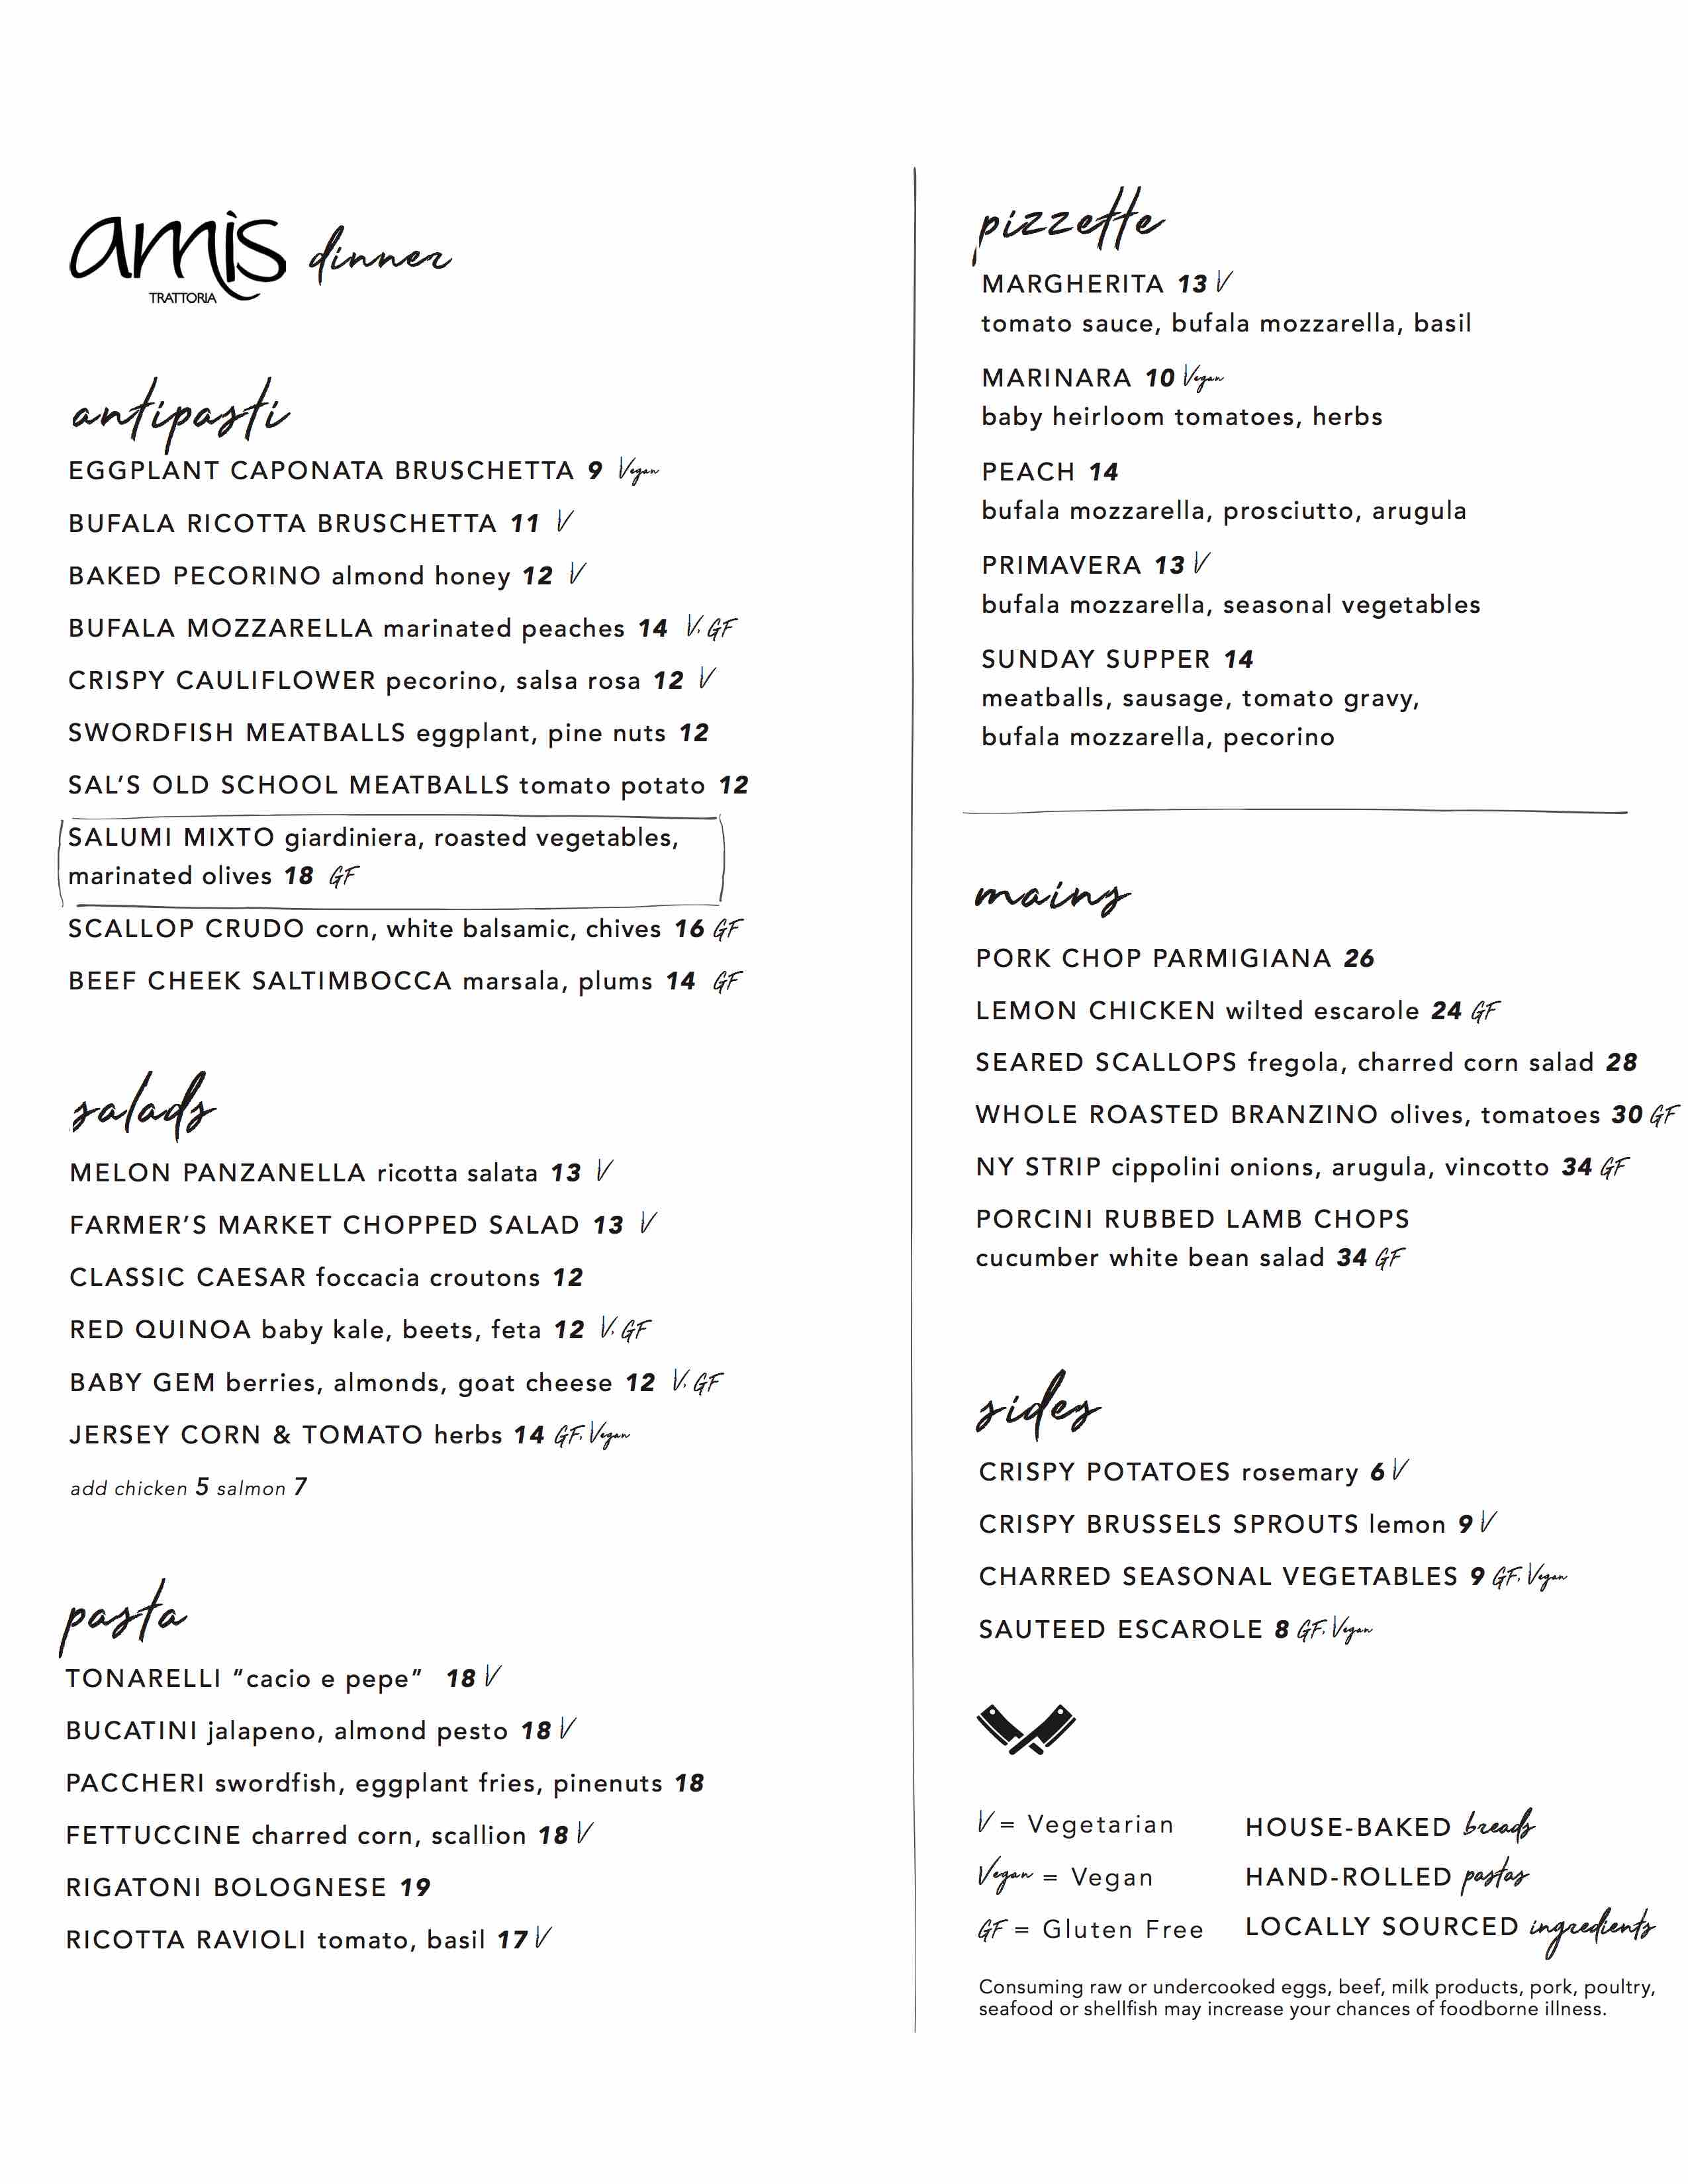 devon yard amis trattoria dinner menu